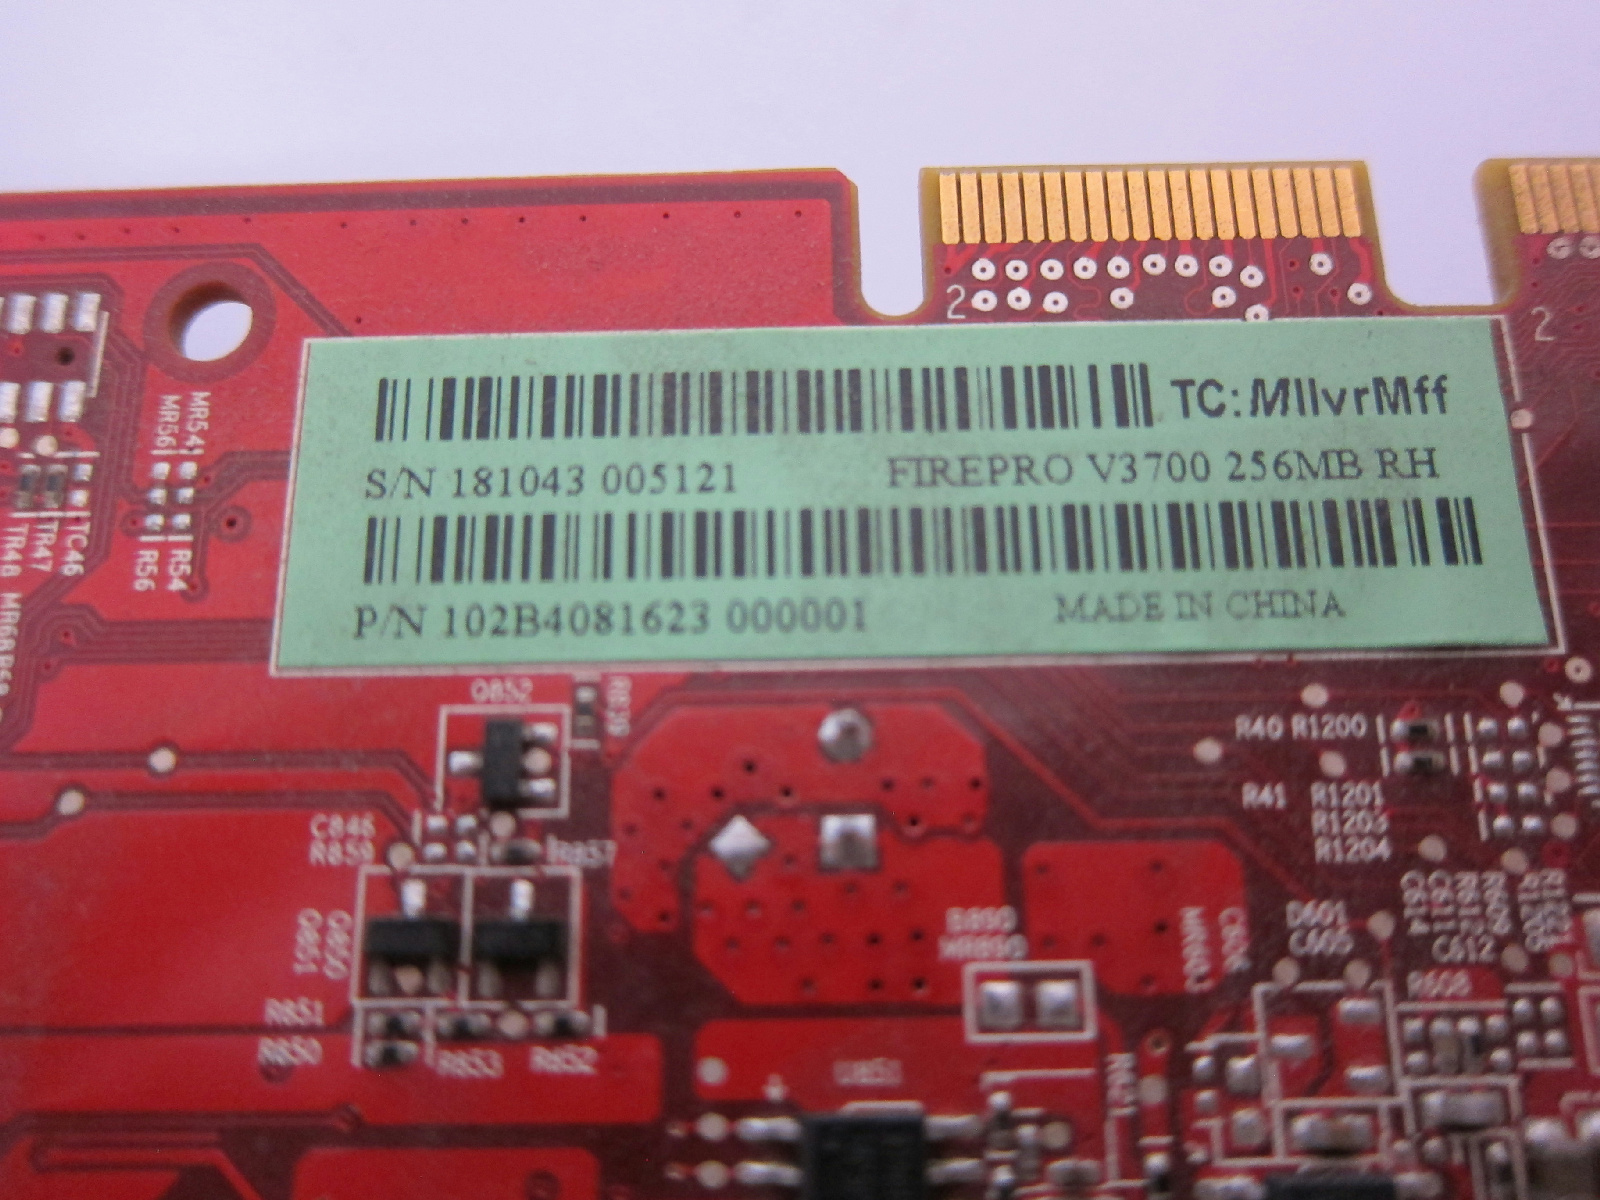 HP ATI FirePro V3700 Graphics Video Card508279-001 519291-001